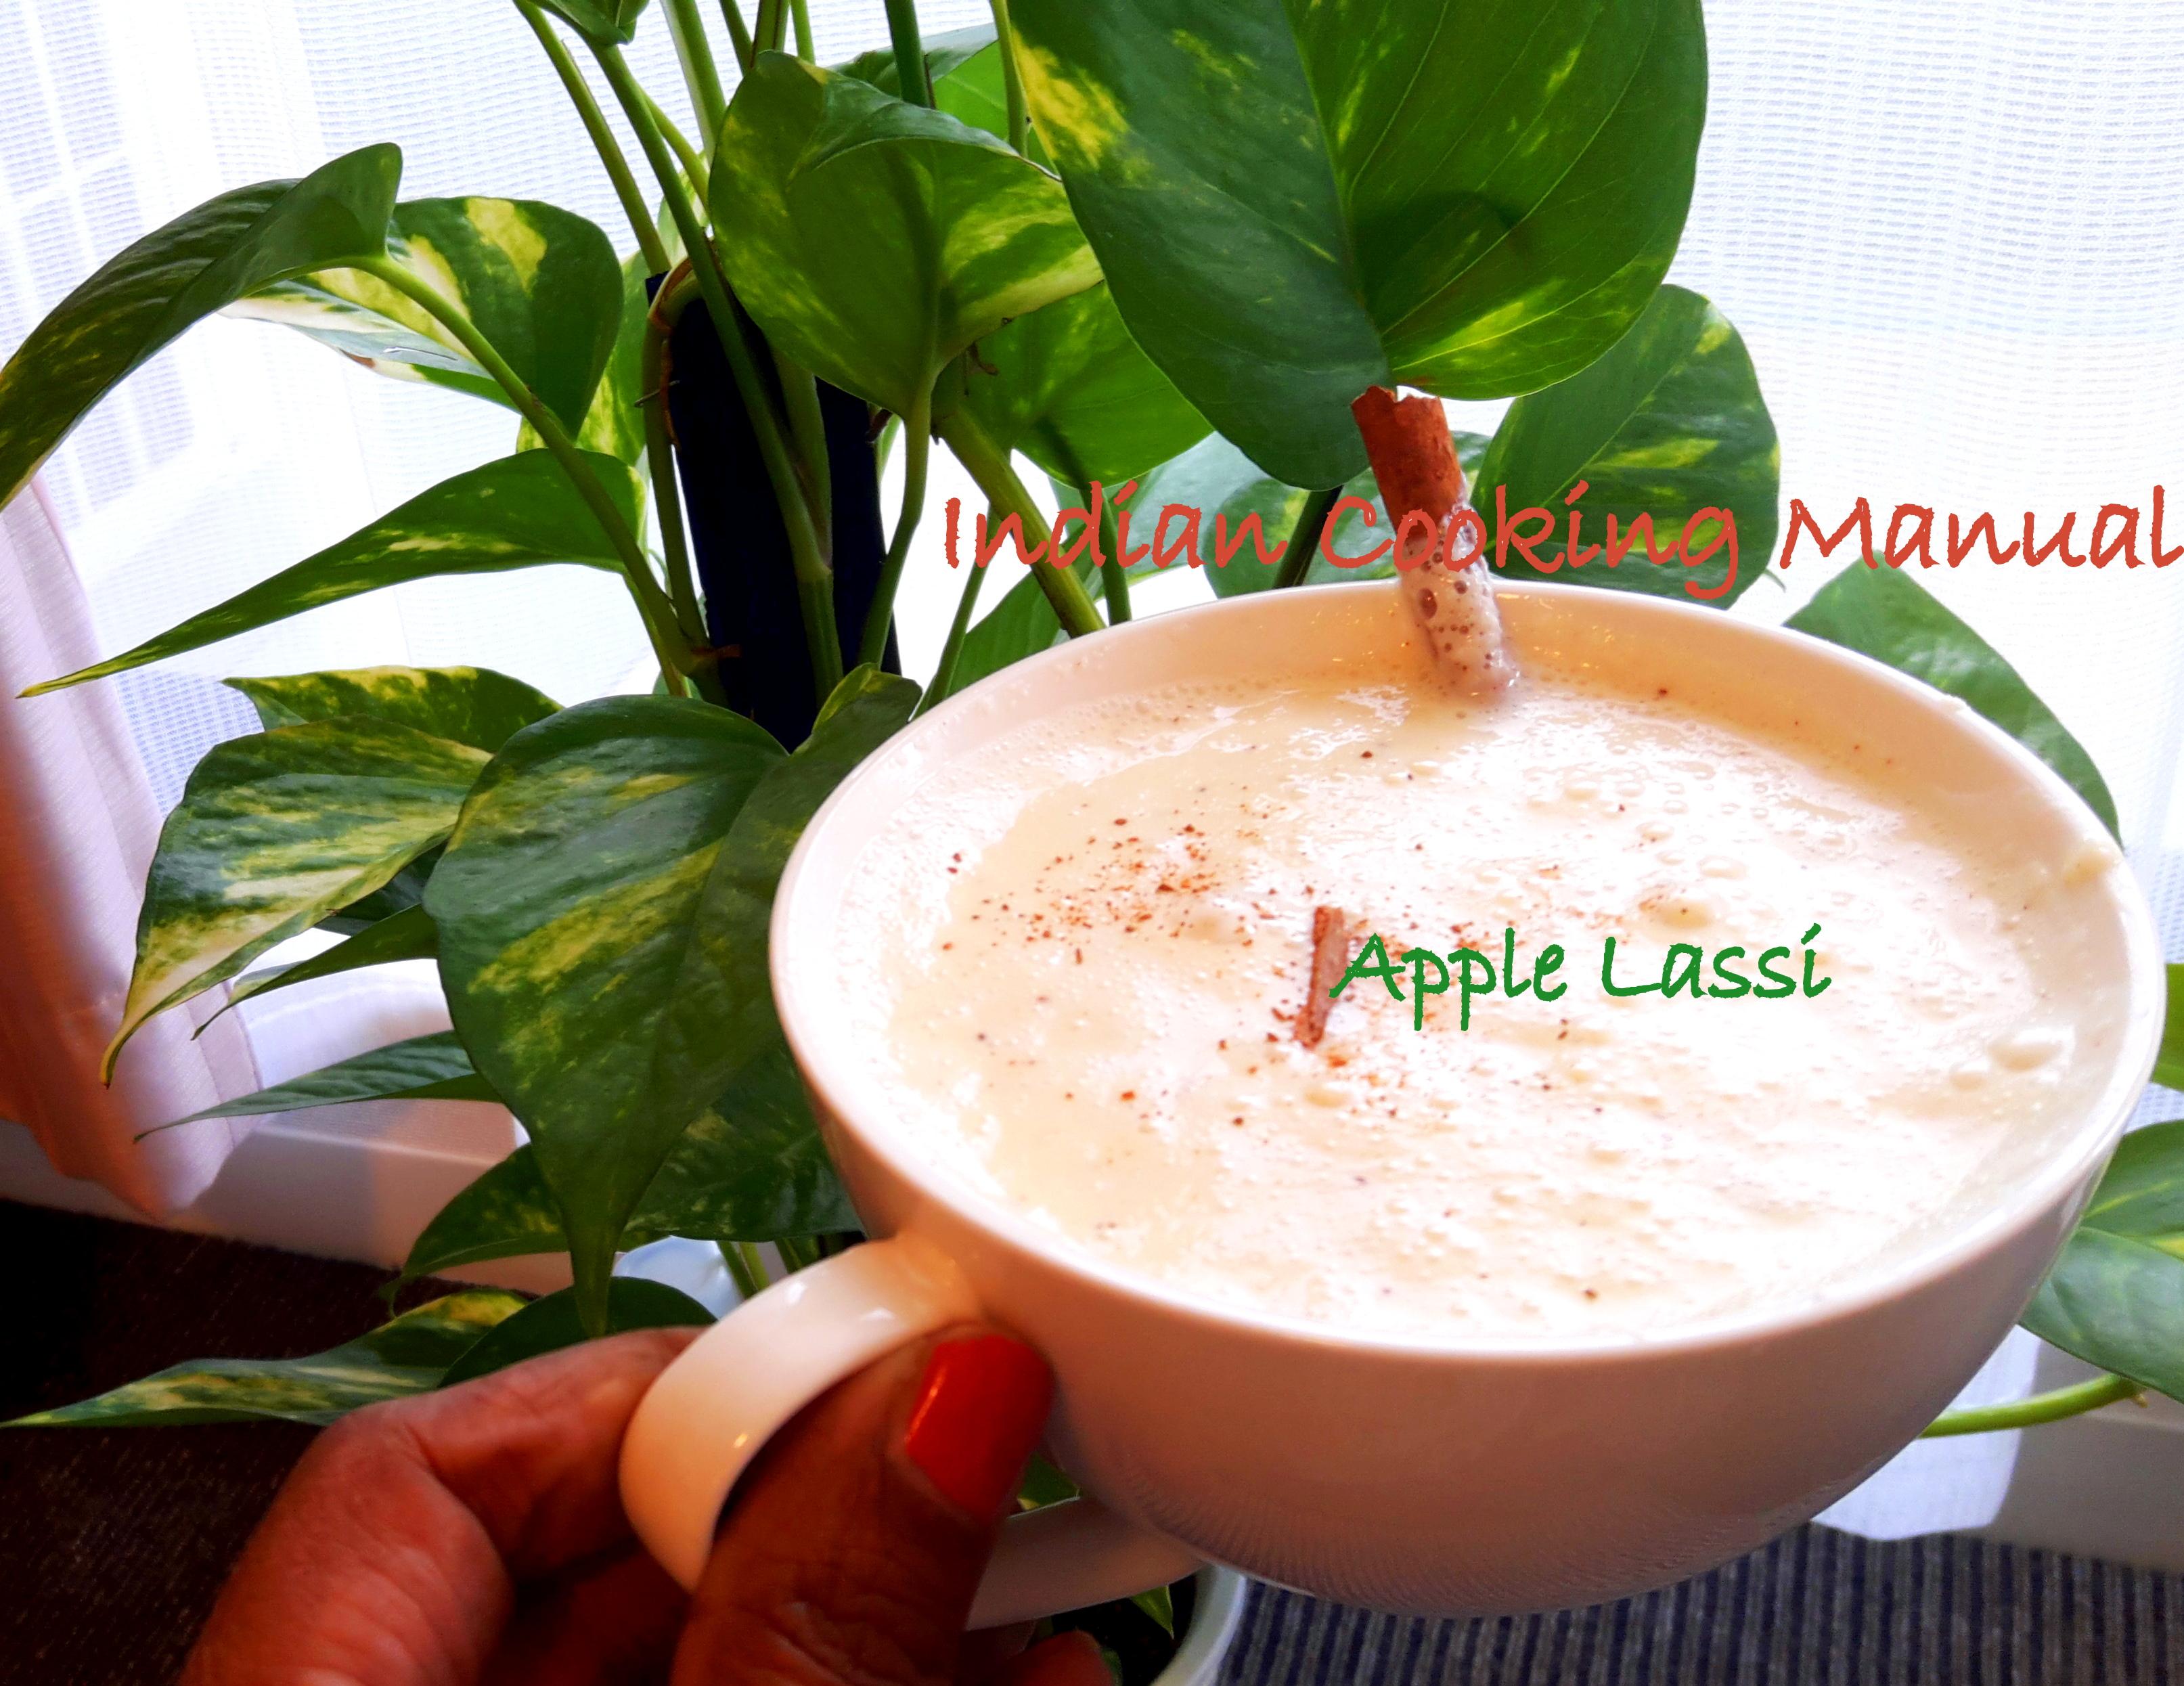 Apple Lassi (curd/yogurt based drink)